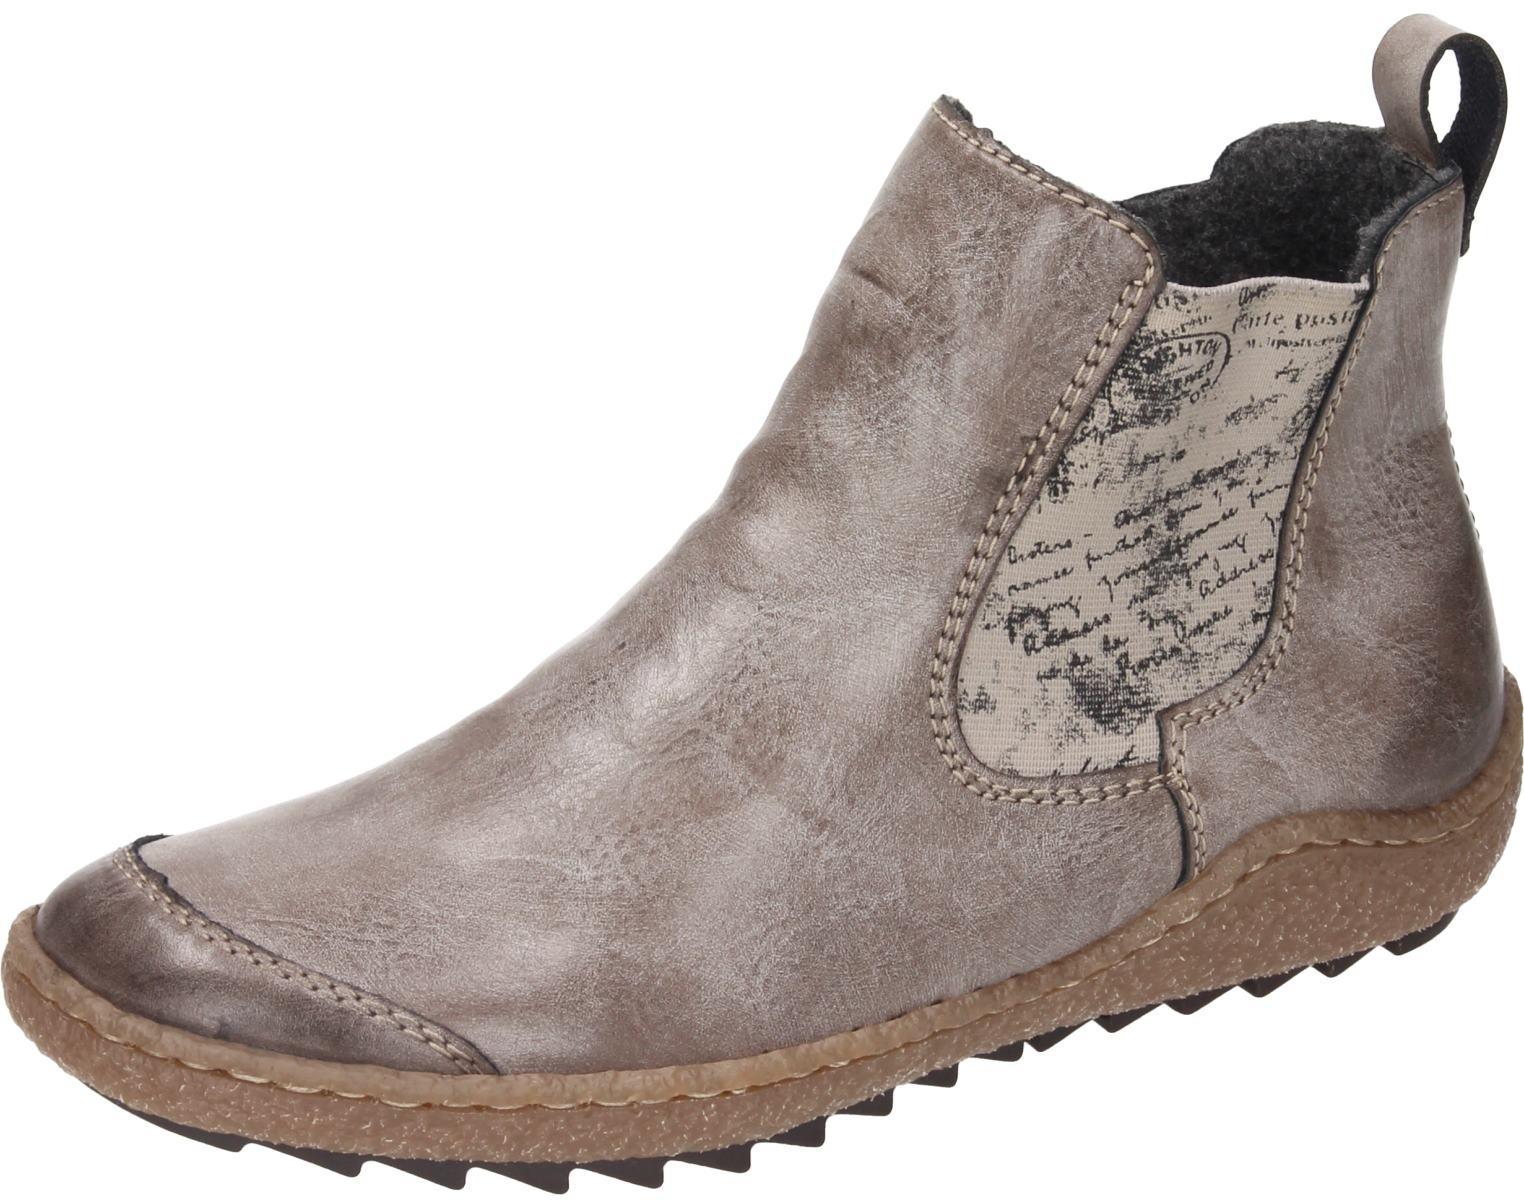 Rieker Damen Schuhe Damen Stiefelette braun Synthetik